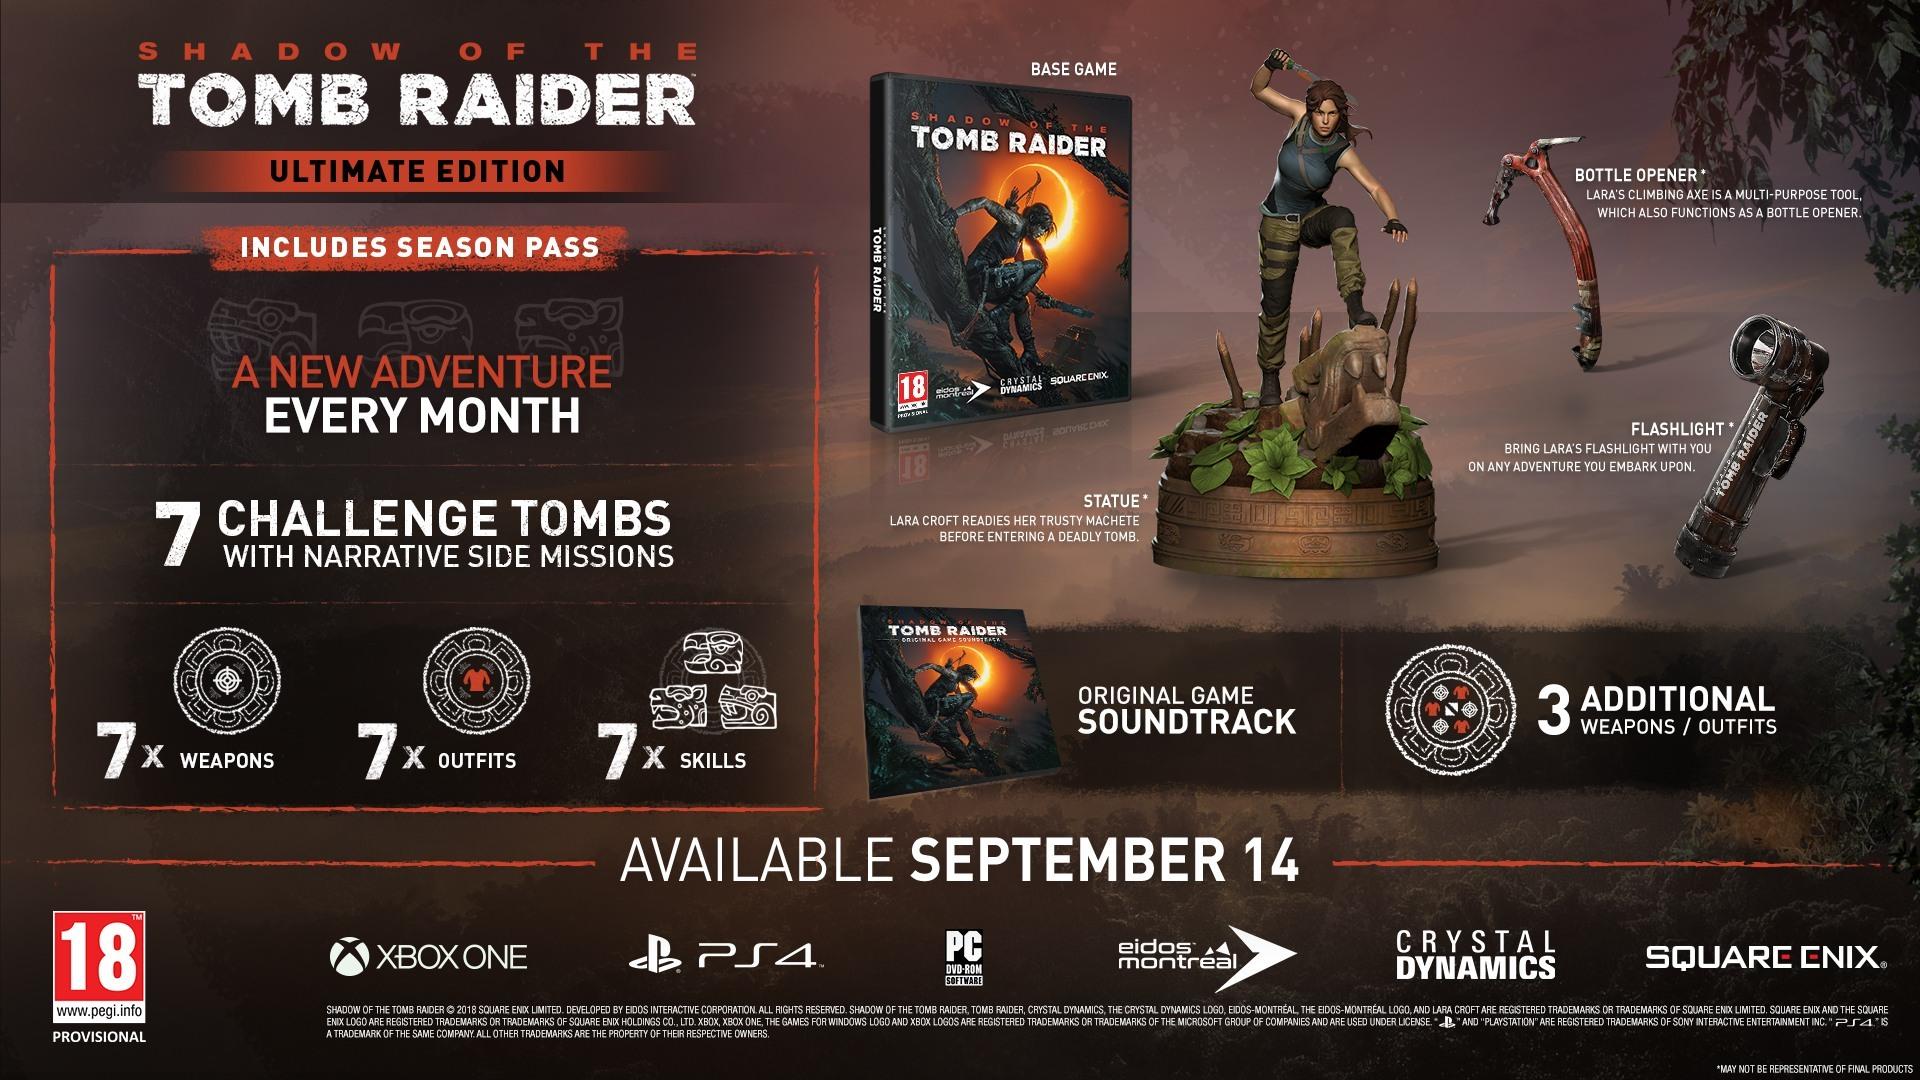 Ultimate Edição - Shadow of the Tomb Raider